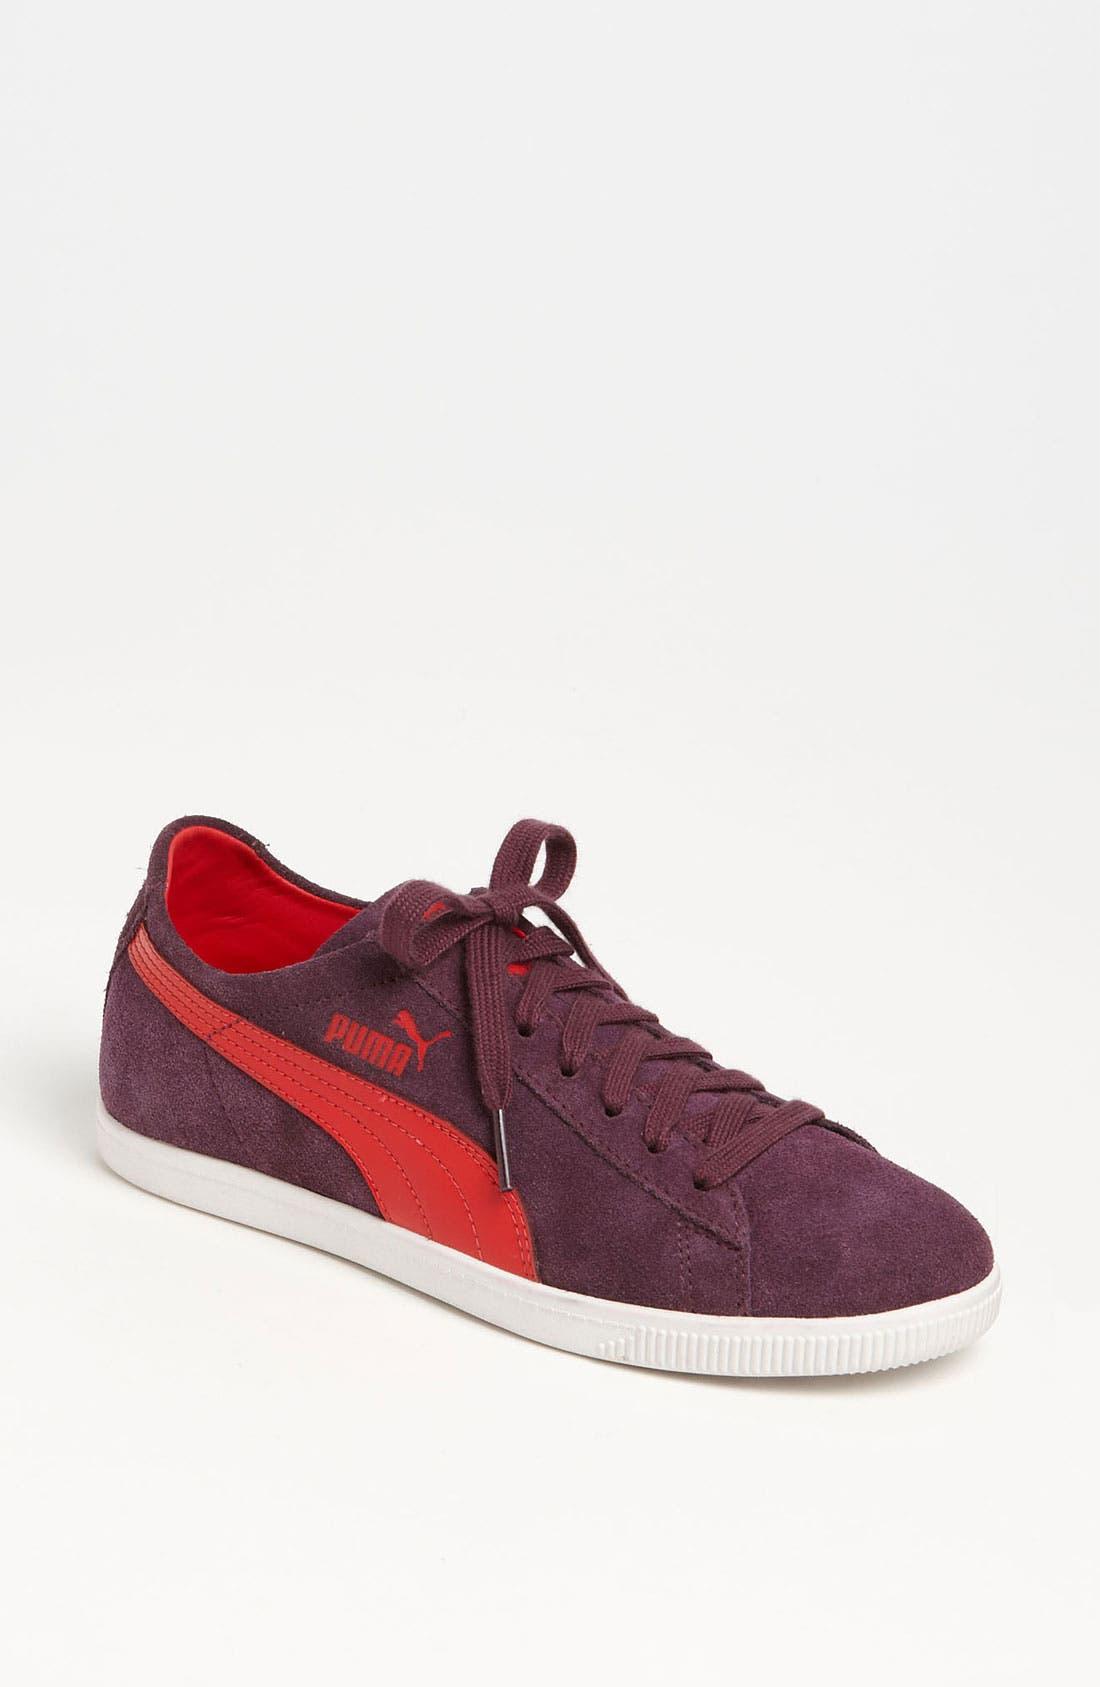 Alternate Image 1 Selected - PUMA 'Glyde Lo' Sneaker (Women)